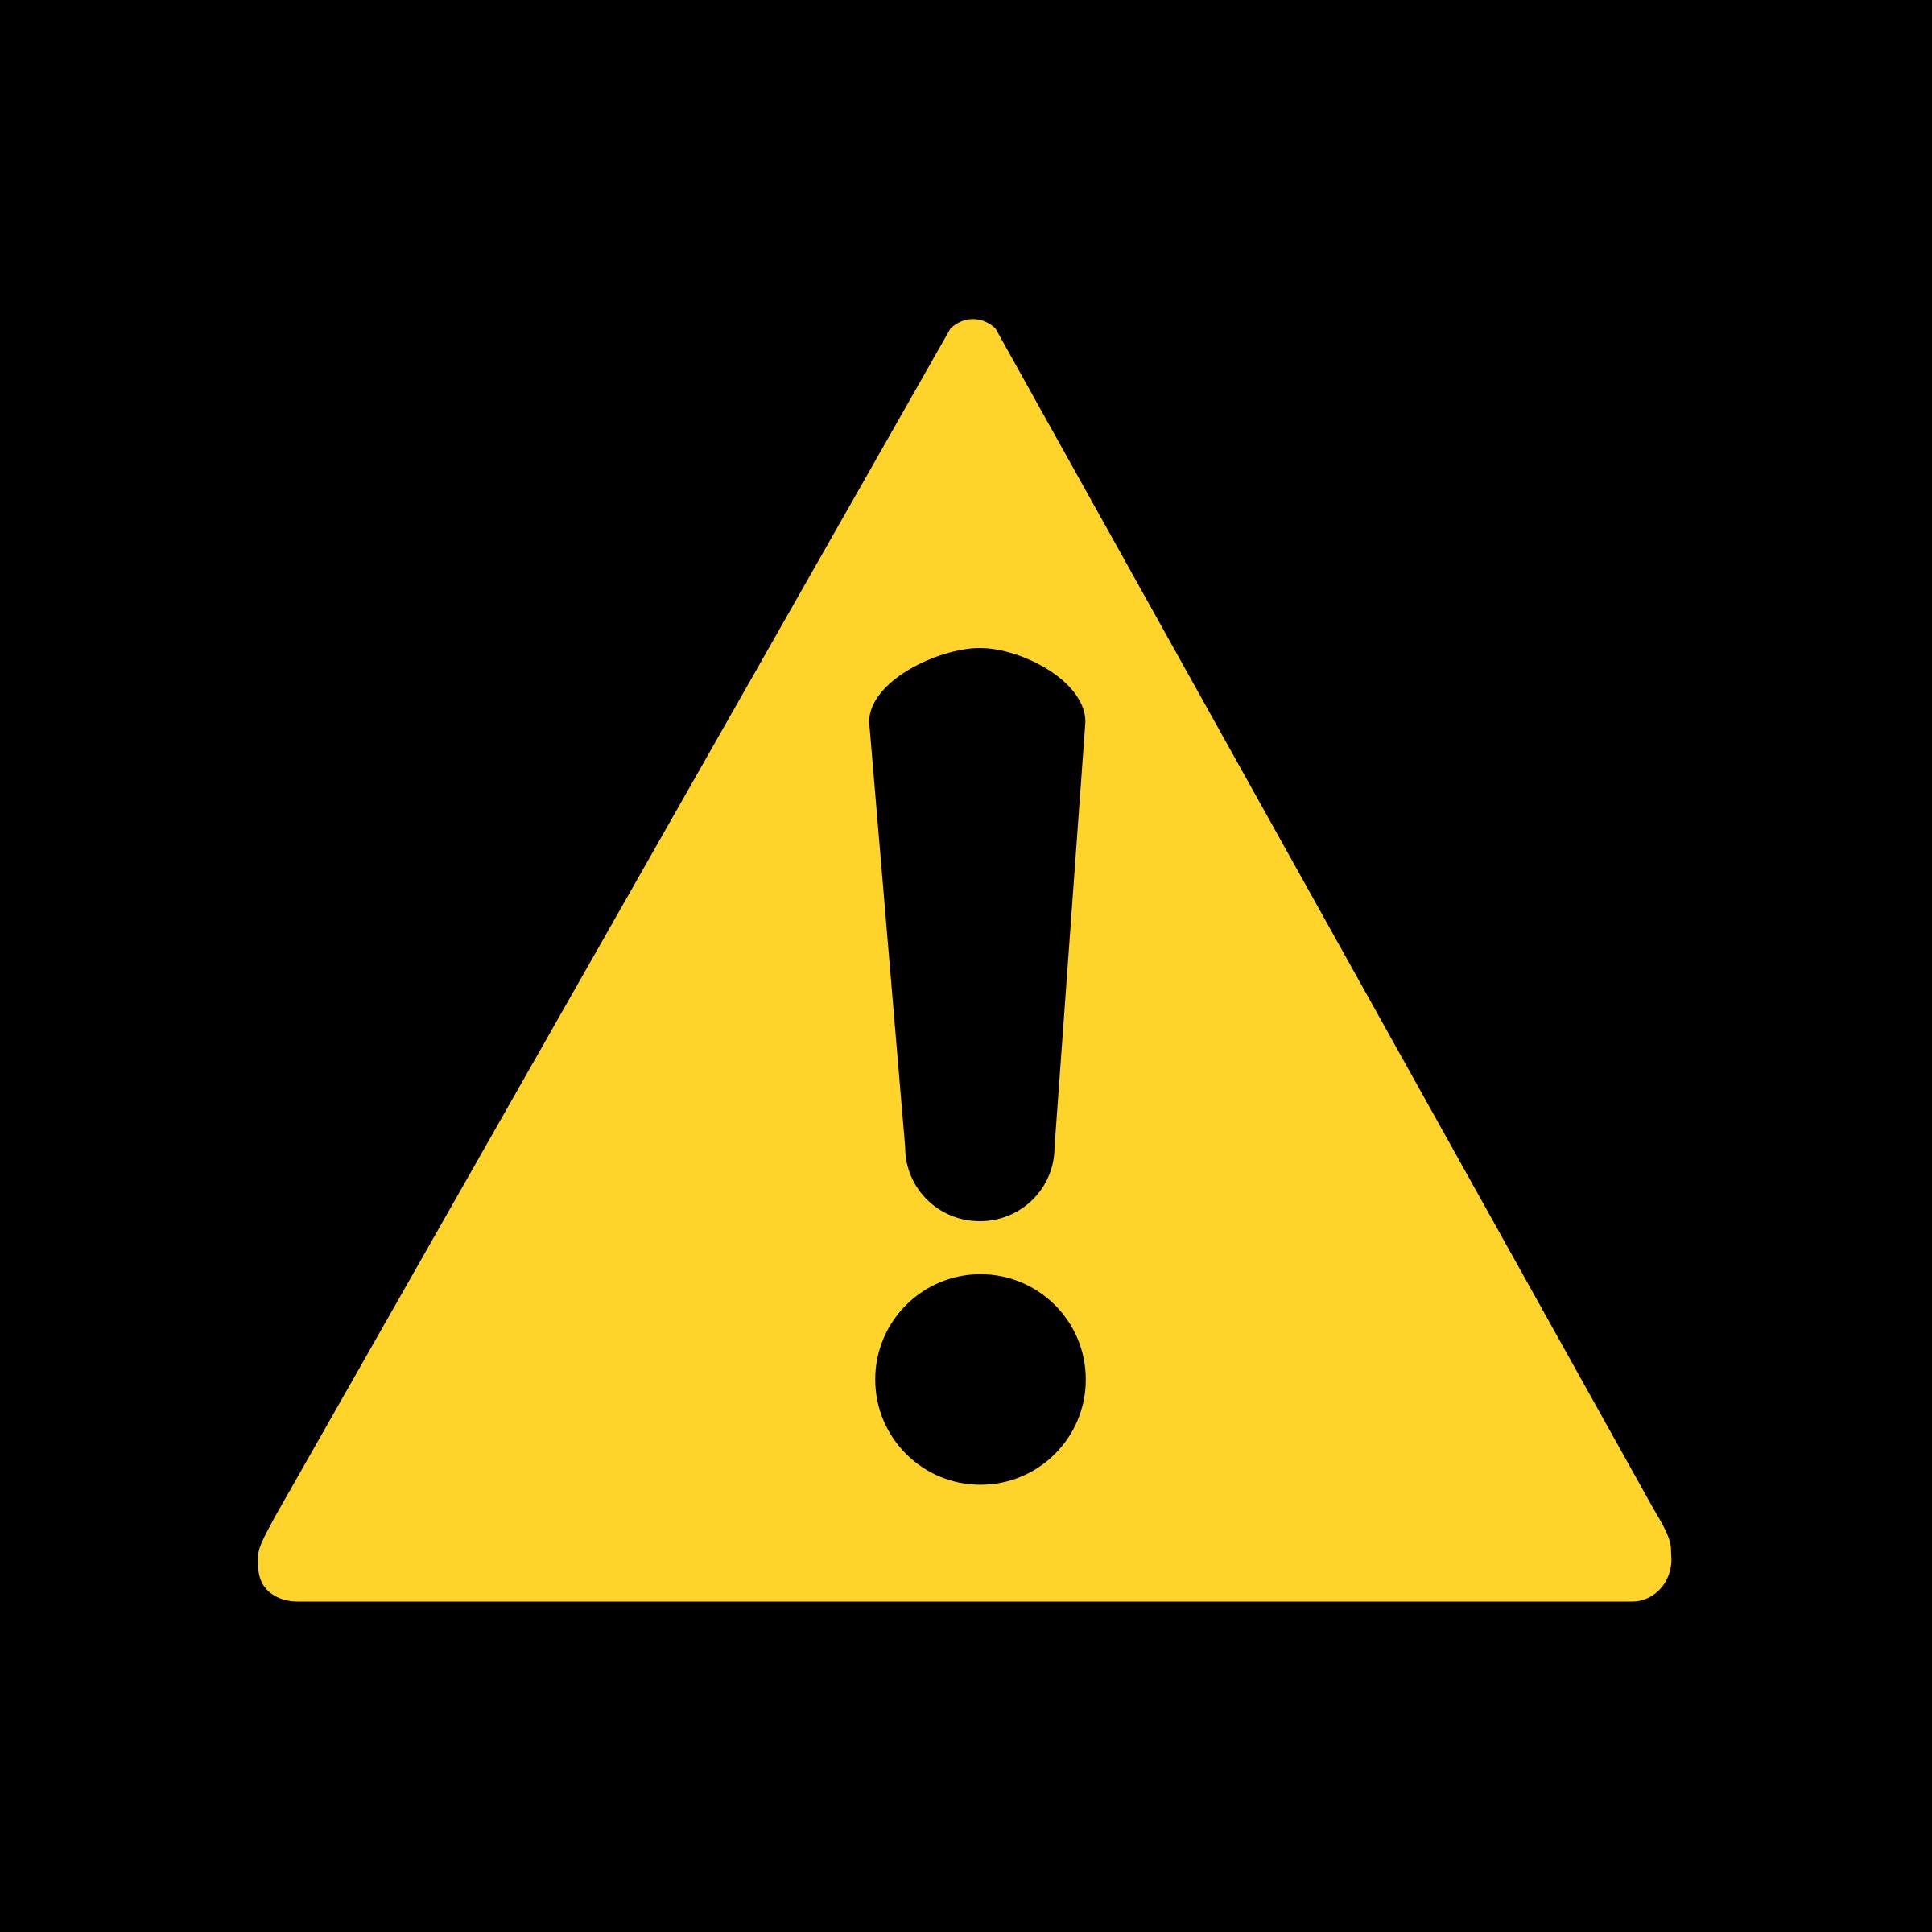 Emergency clipart warning symbol. Icon by matthewgarysmith signs